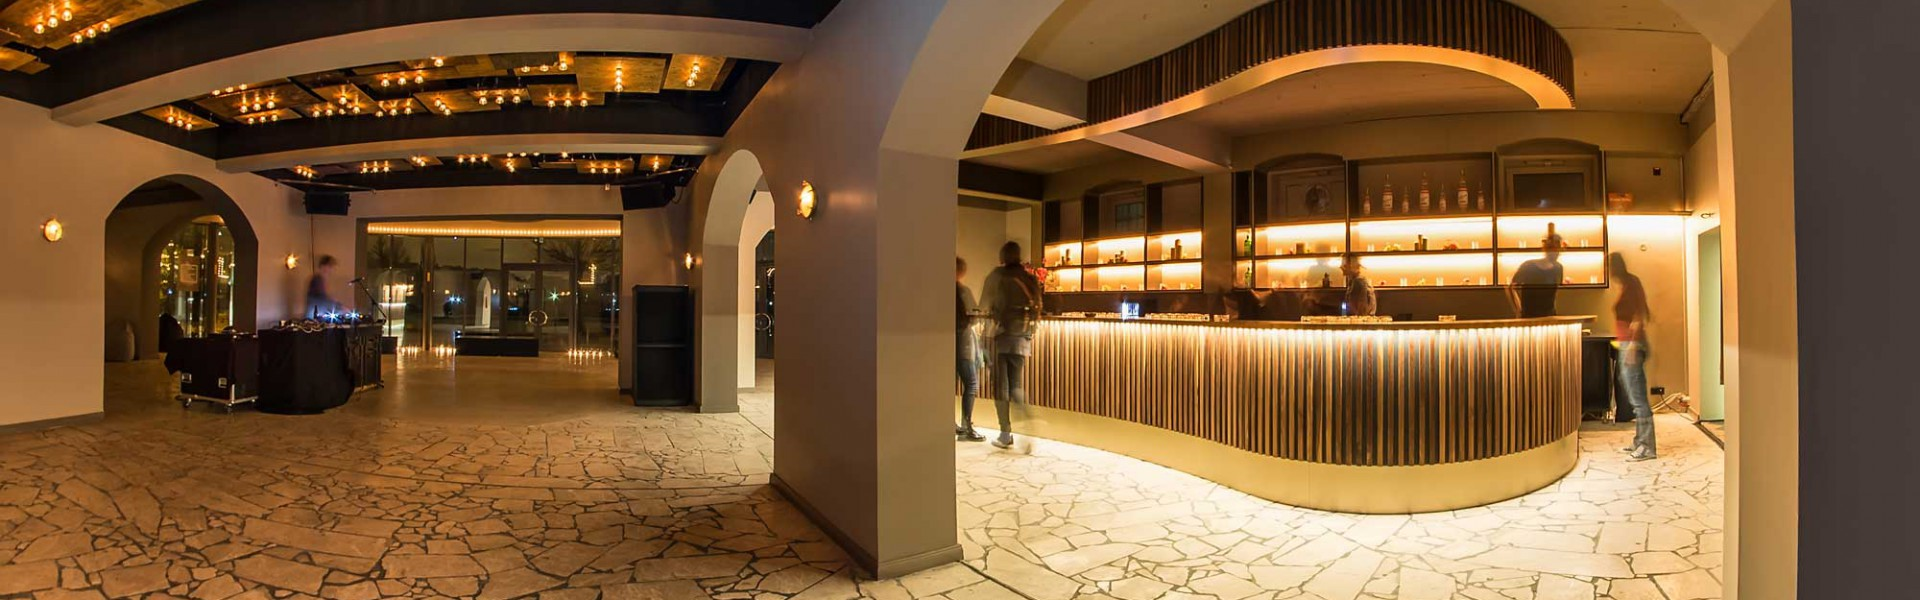 Club-Restaurant-Bar-Kaffeehaus-Barbereich-Massivholz-Nuss-Kupfer-Aluminium2